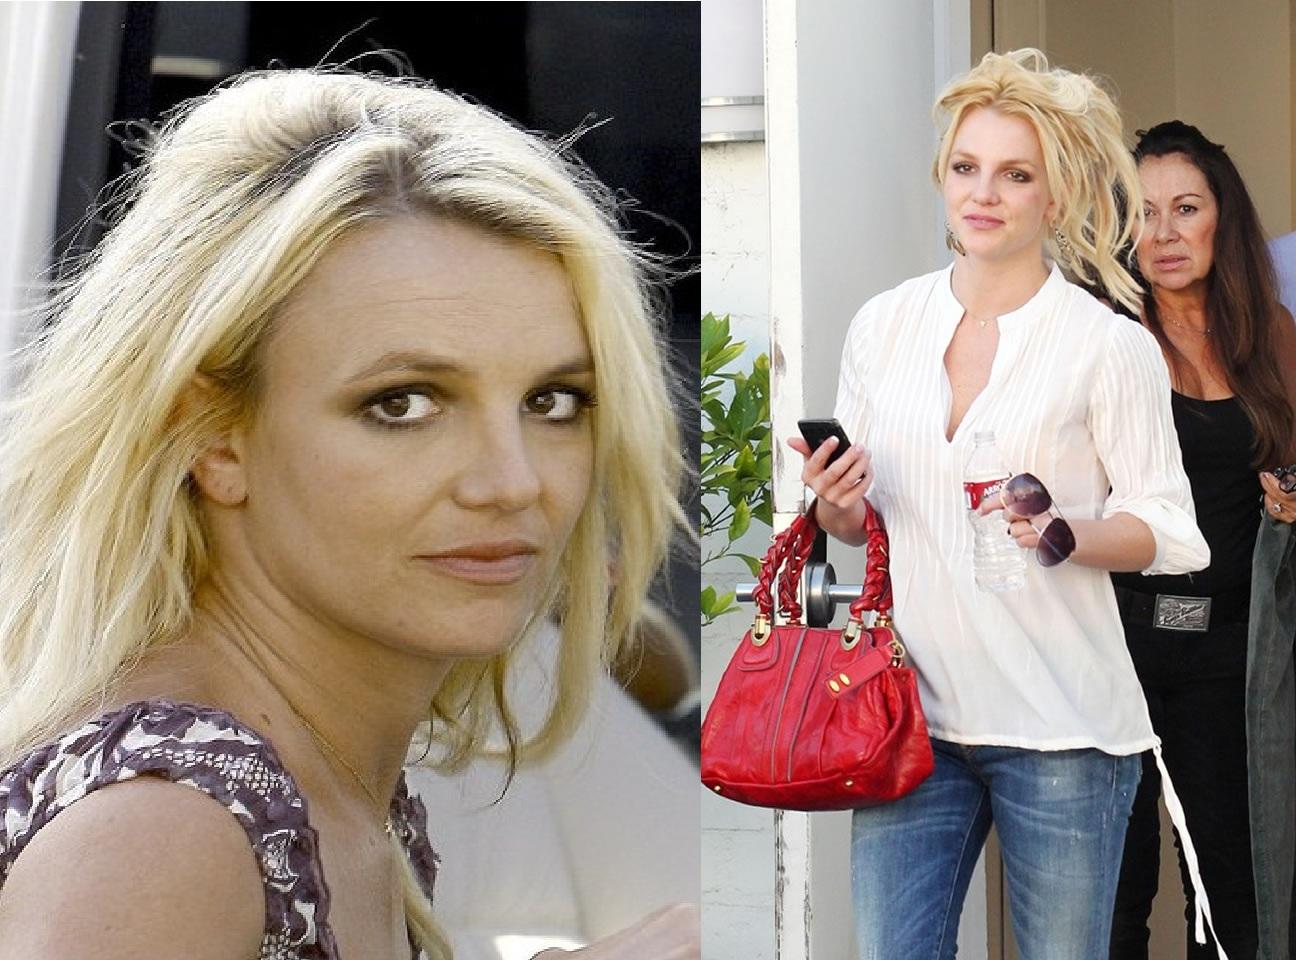 Britneyspearswithoutmakeup